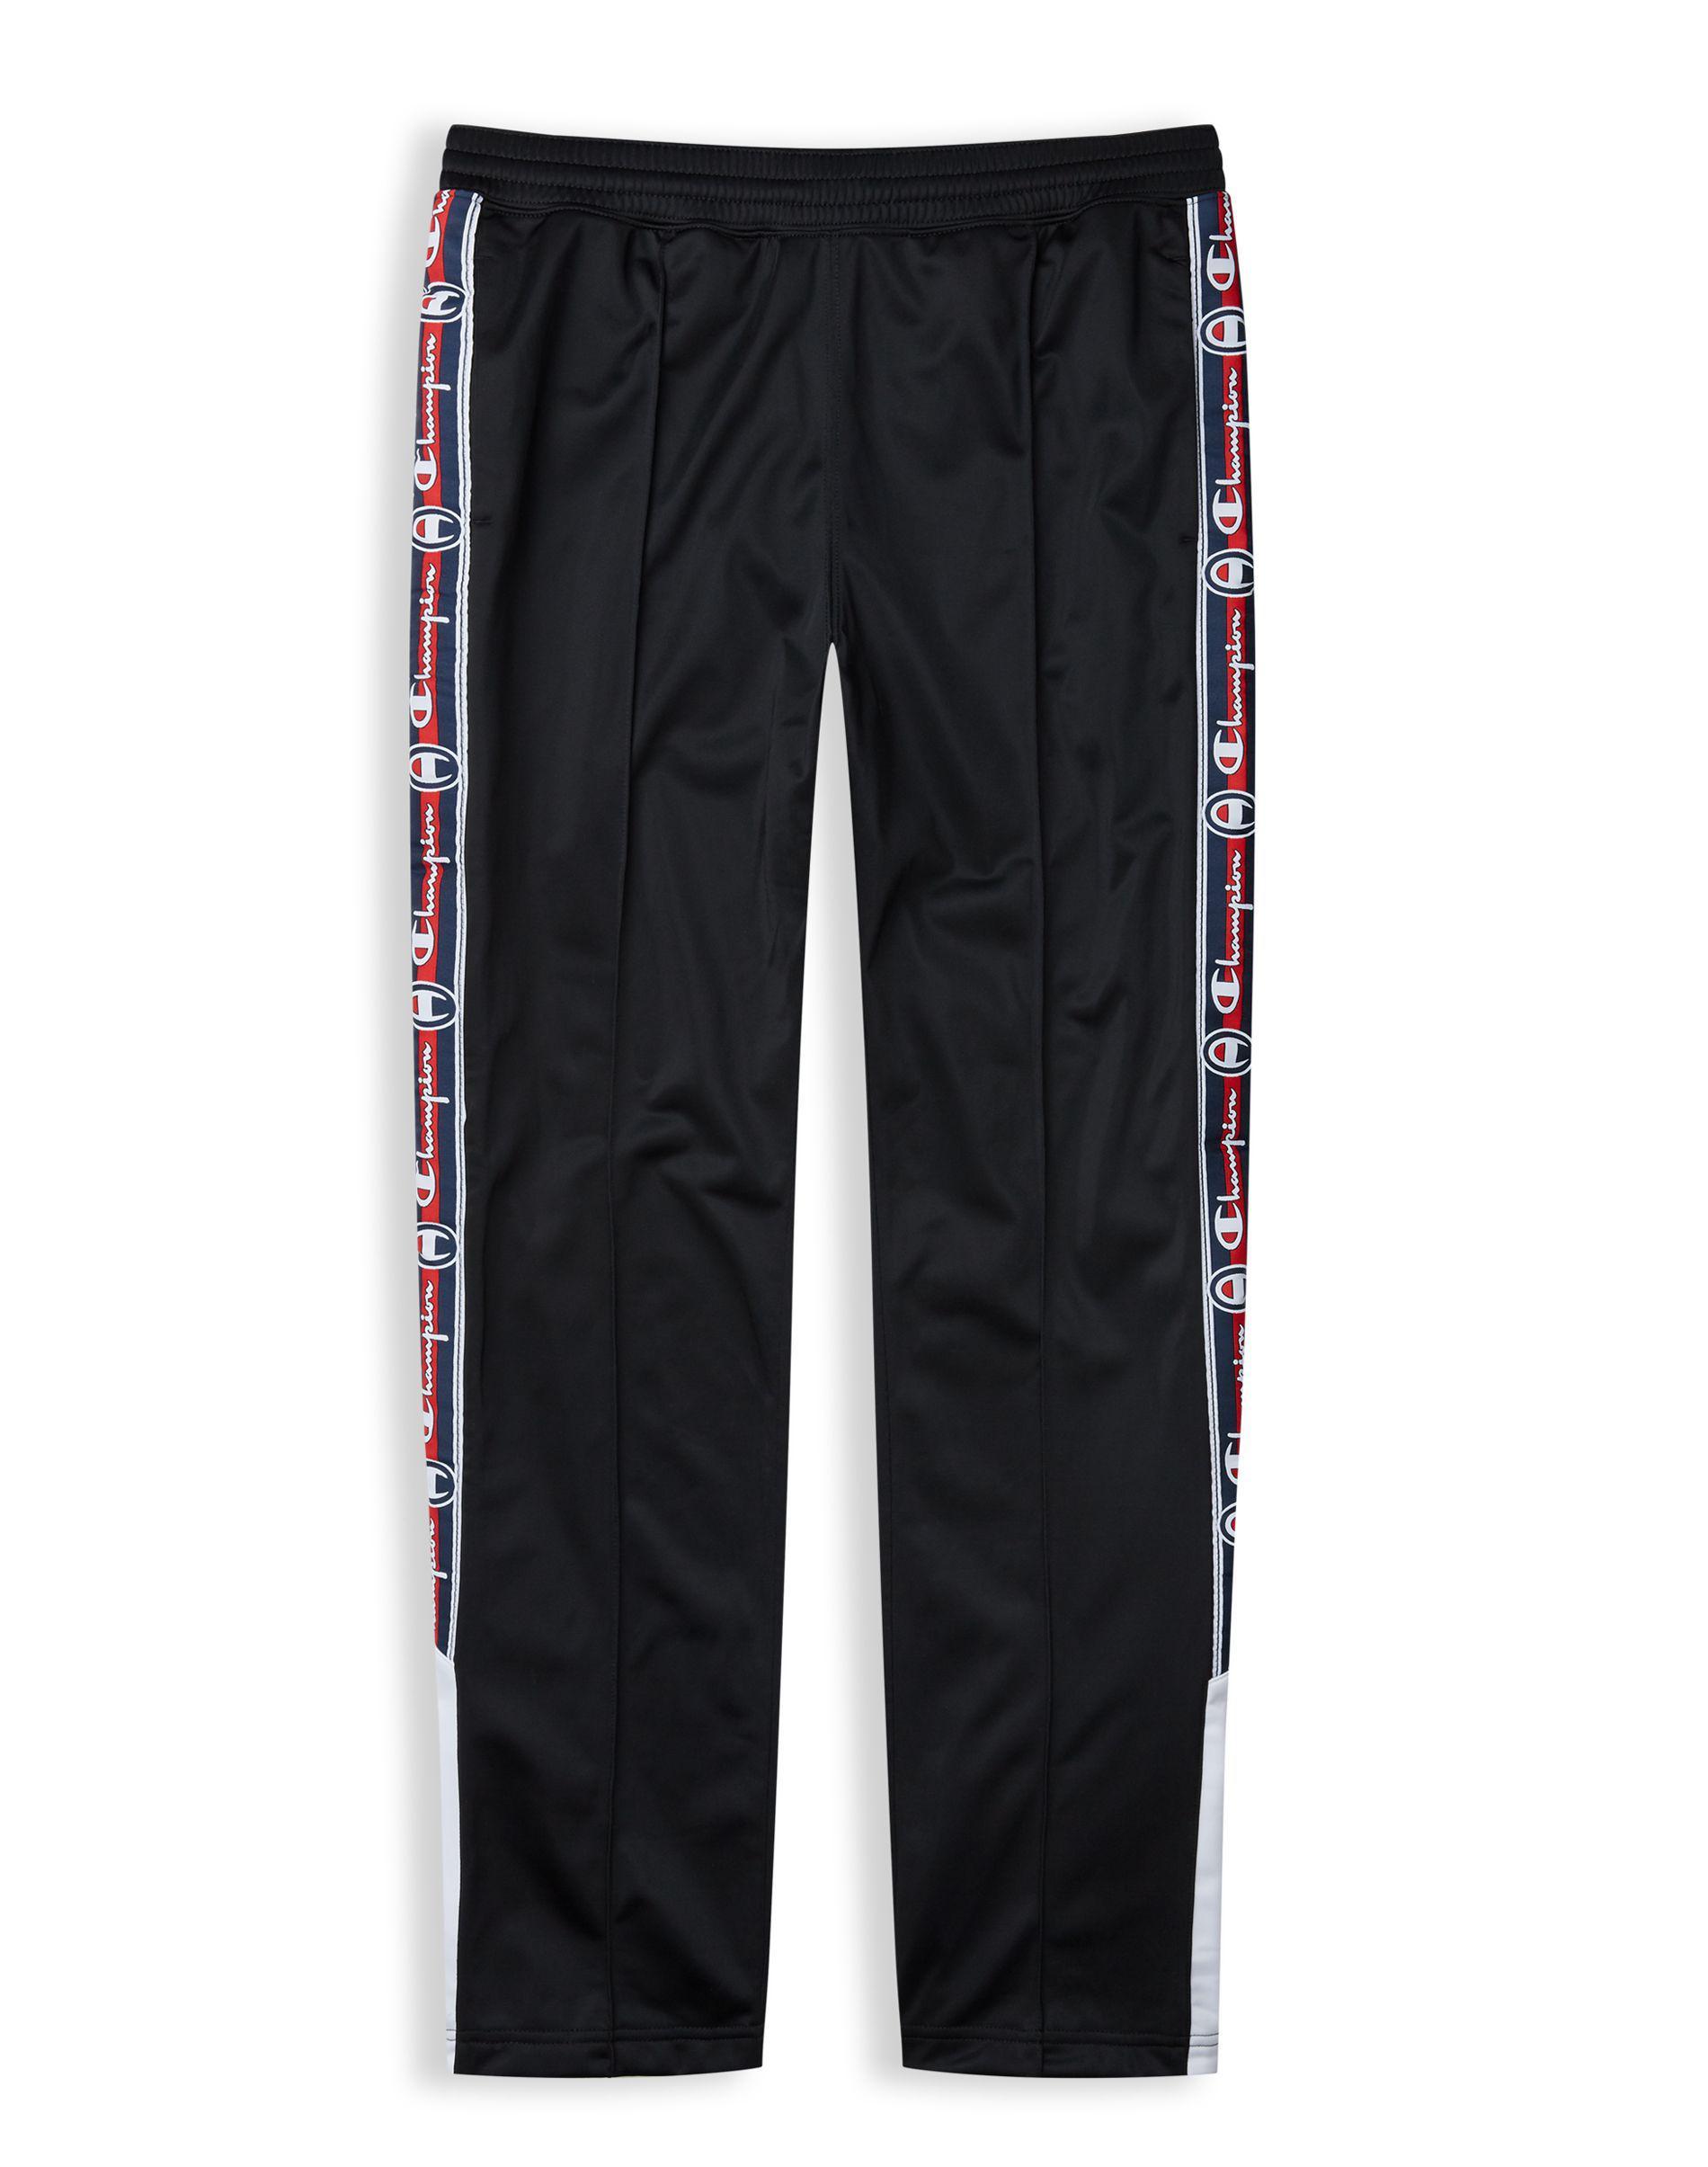 0a885340ba4a4 Champion Black Europe Premium Tearaway Pants for men